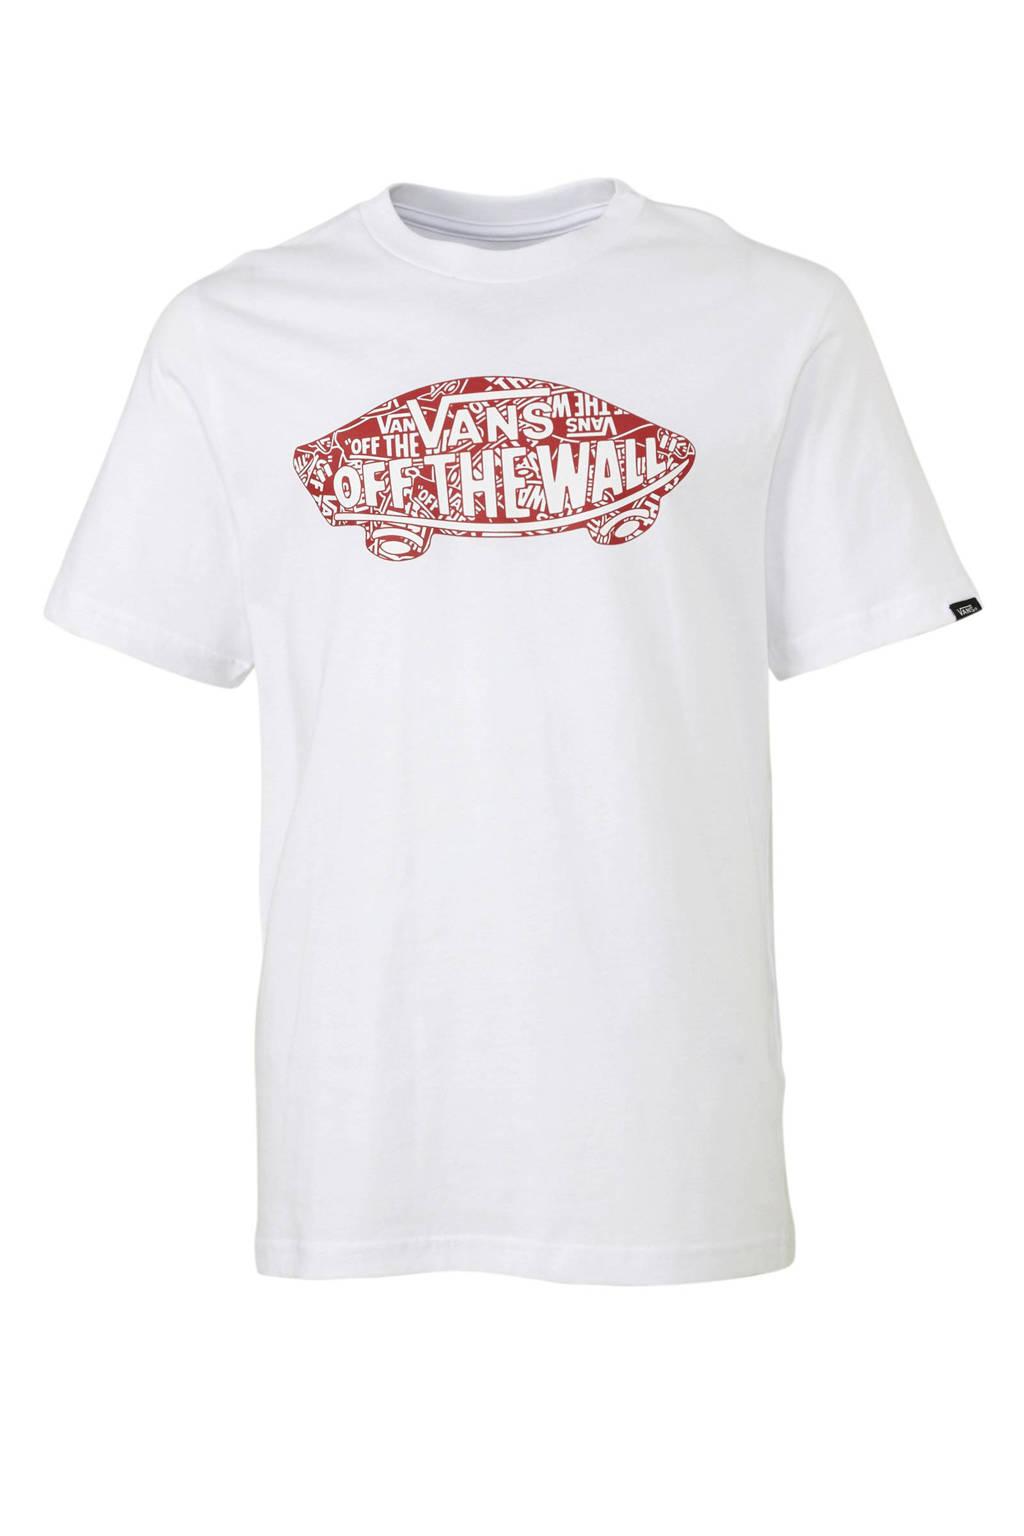 VANS T-shirt met logo wit/rood, Wit/rood